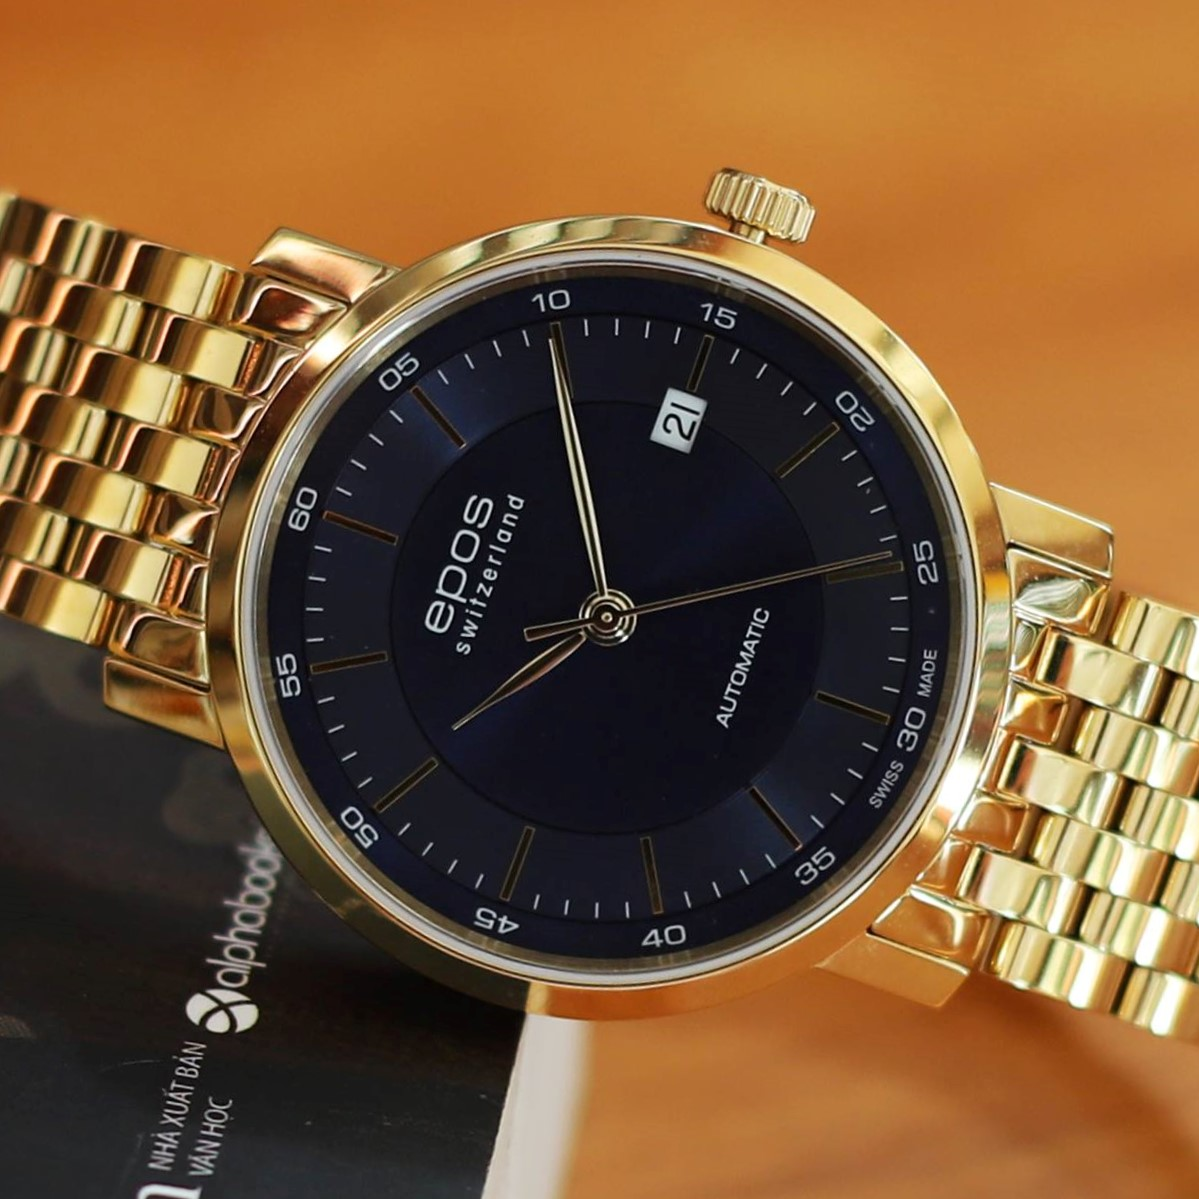 Đồng hồ Epos Swiss